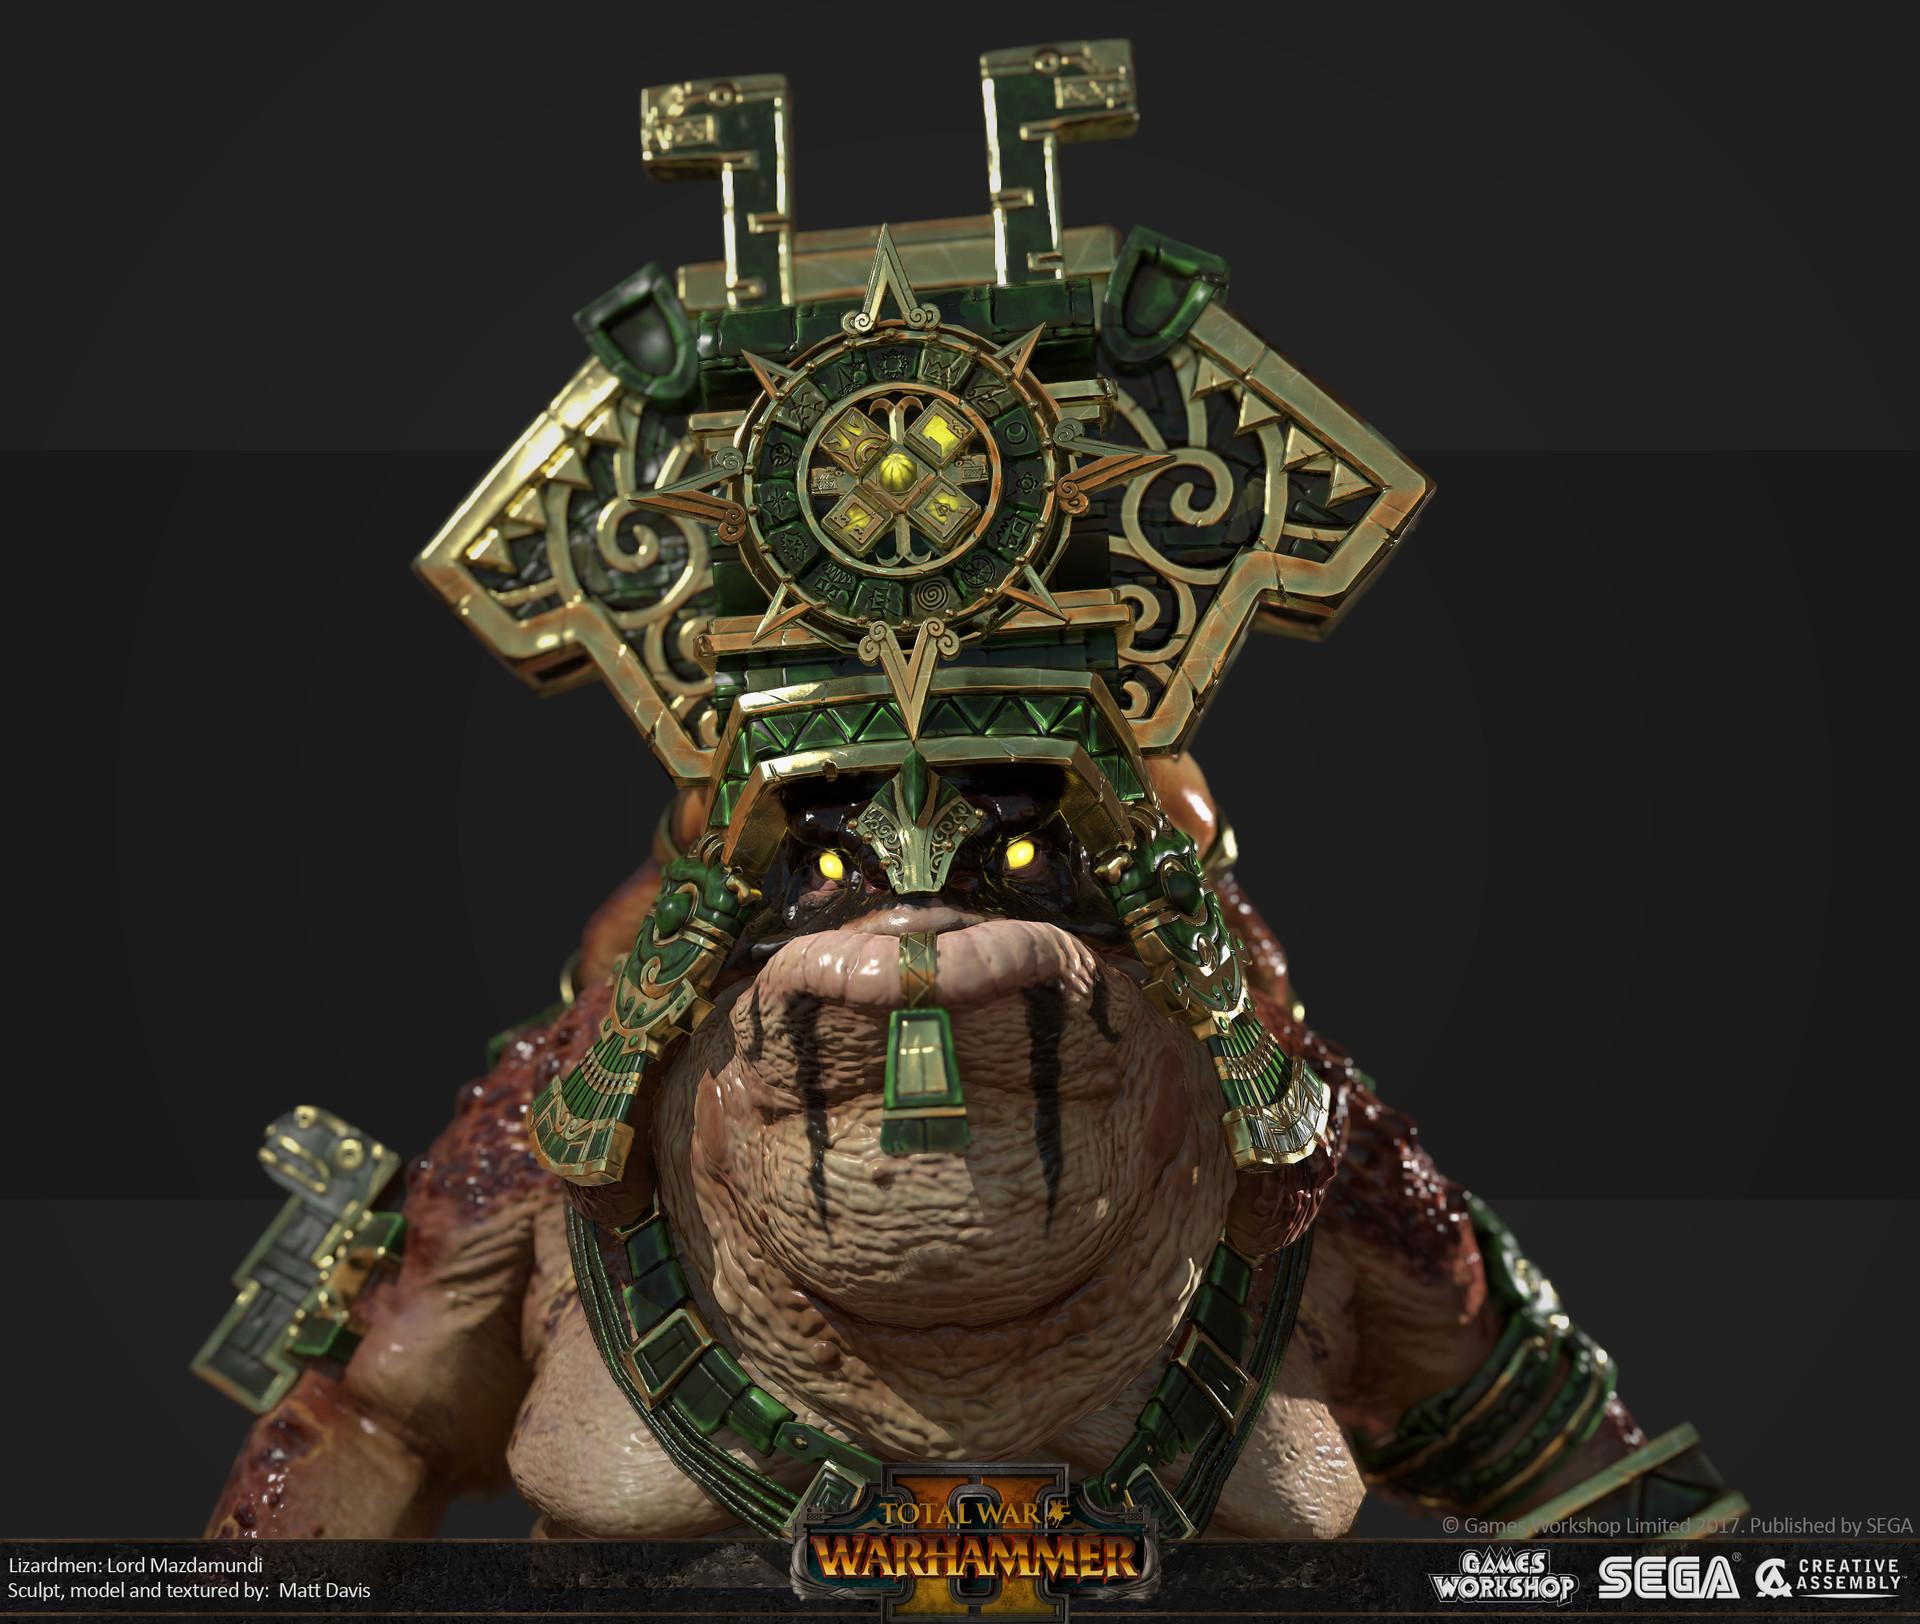 Total War Warhammer Wallpaper Hd Matthew Davis Total War Warhammer 2 Lord Mazdamundi